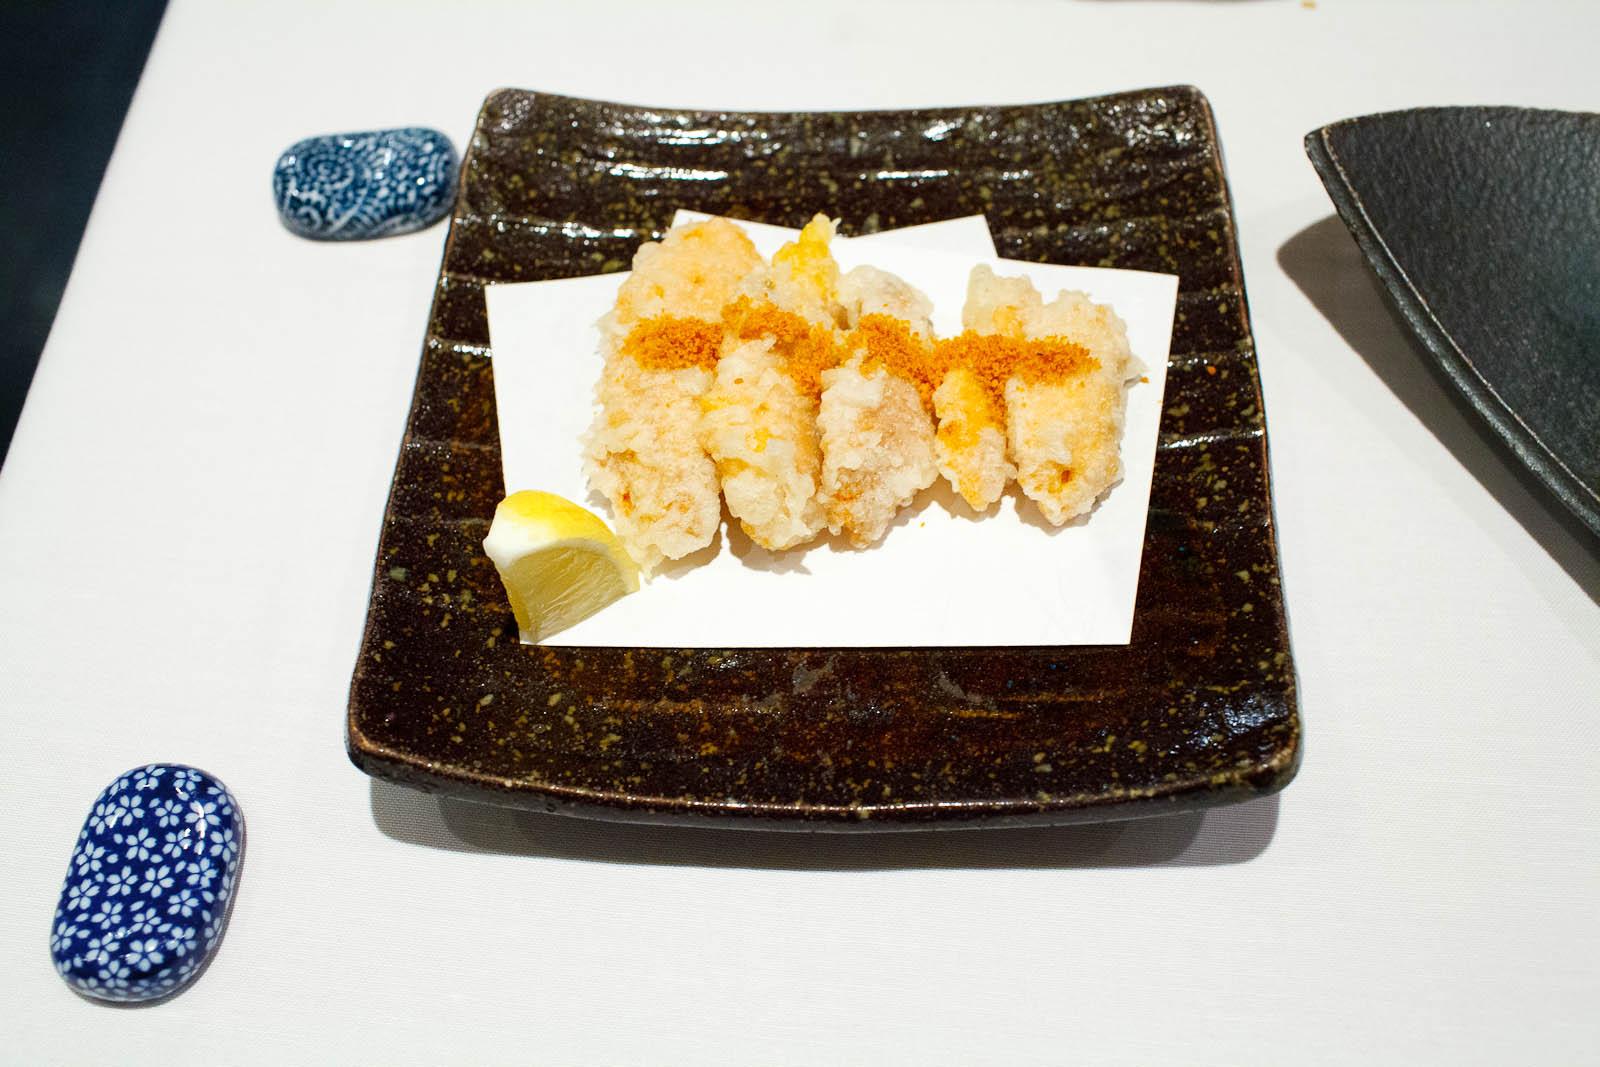 Uni tempura with uni powder - deep fried sashimi quality sea urc